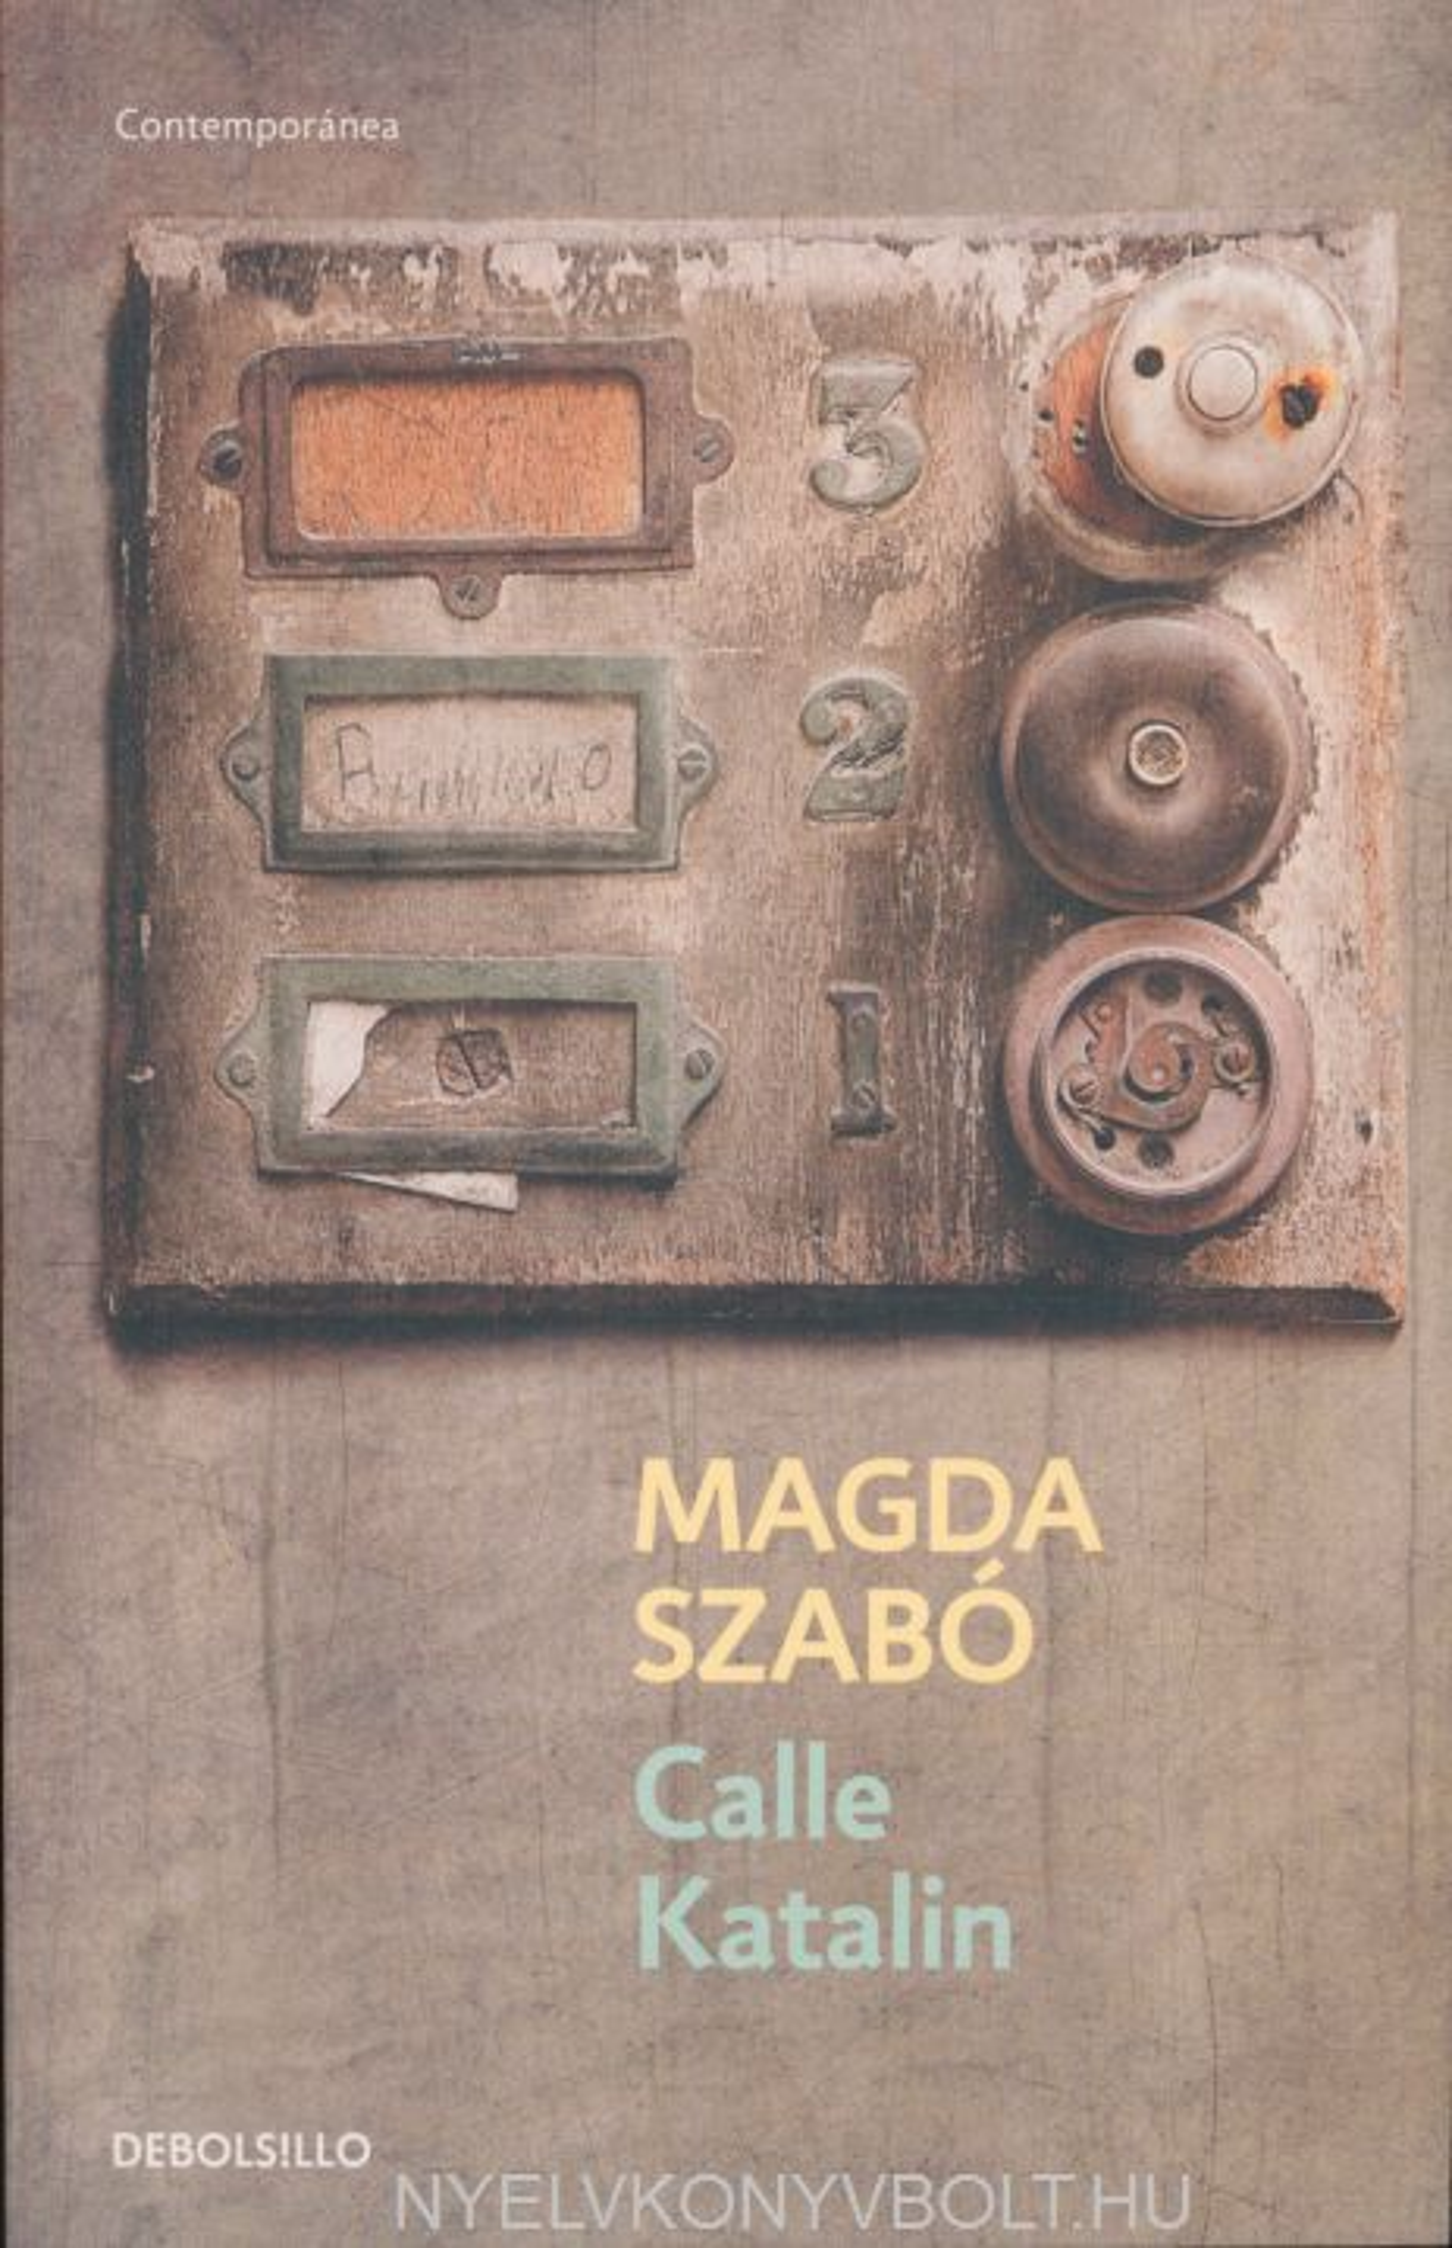 Szabó Magda: Calle Katalin